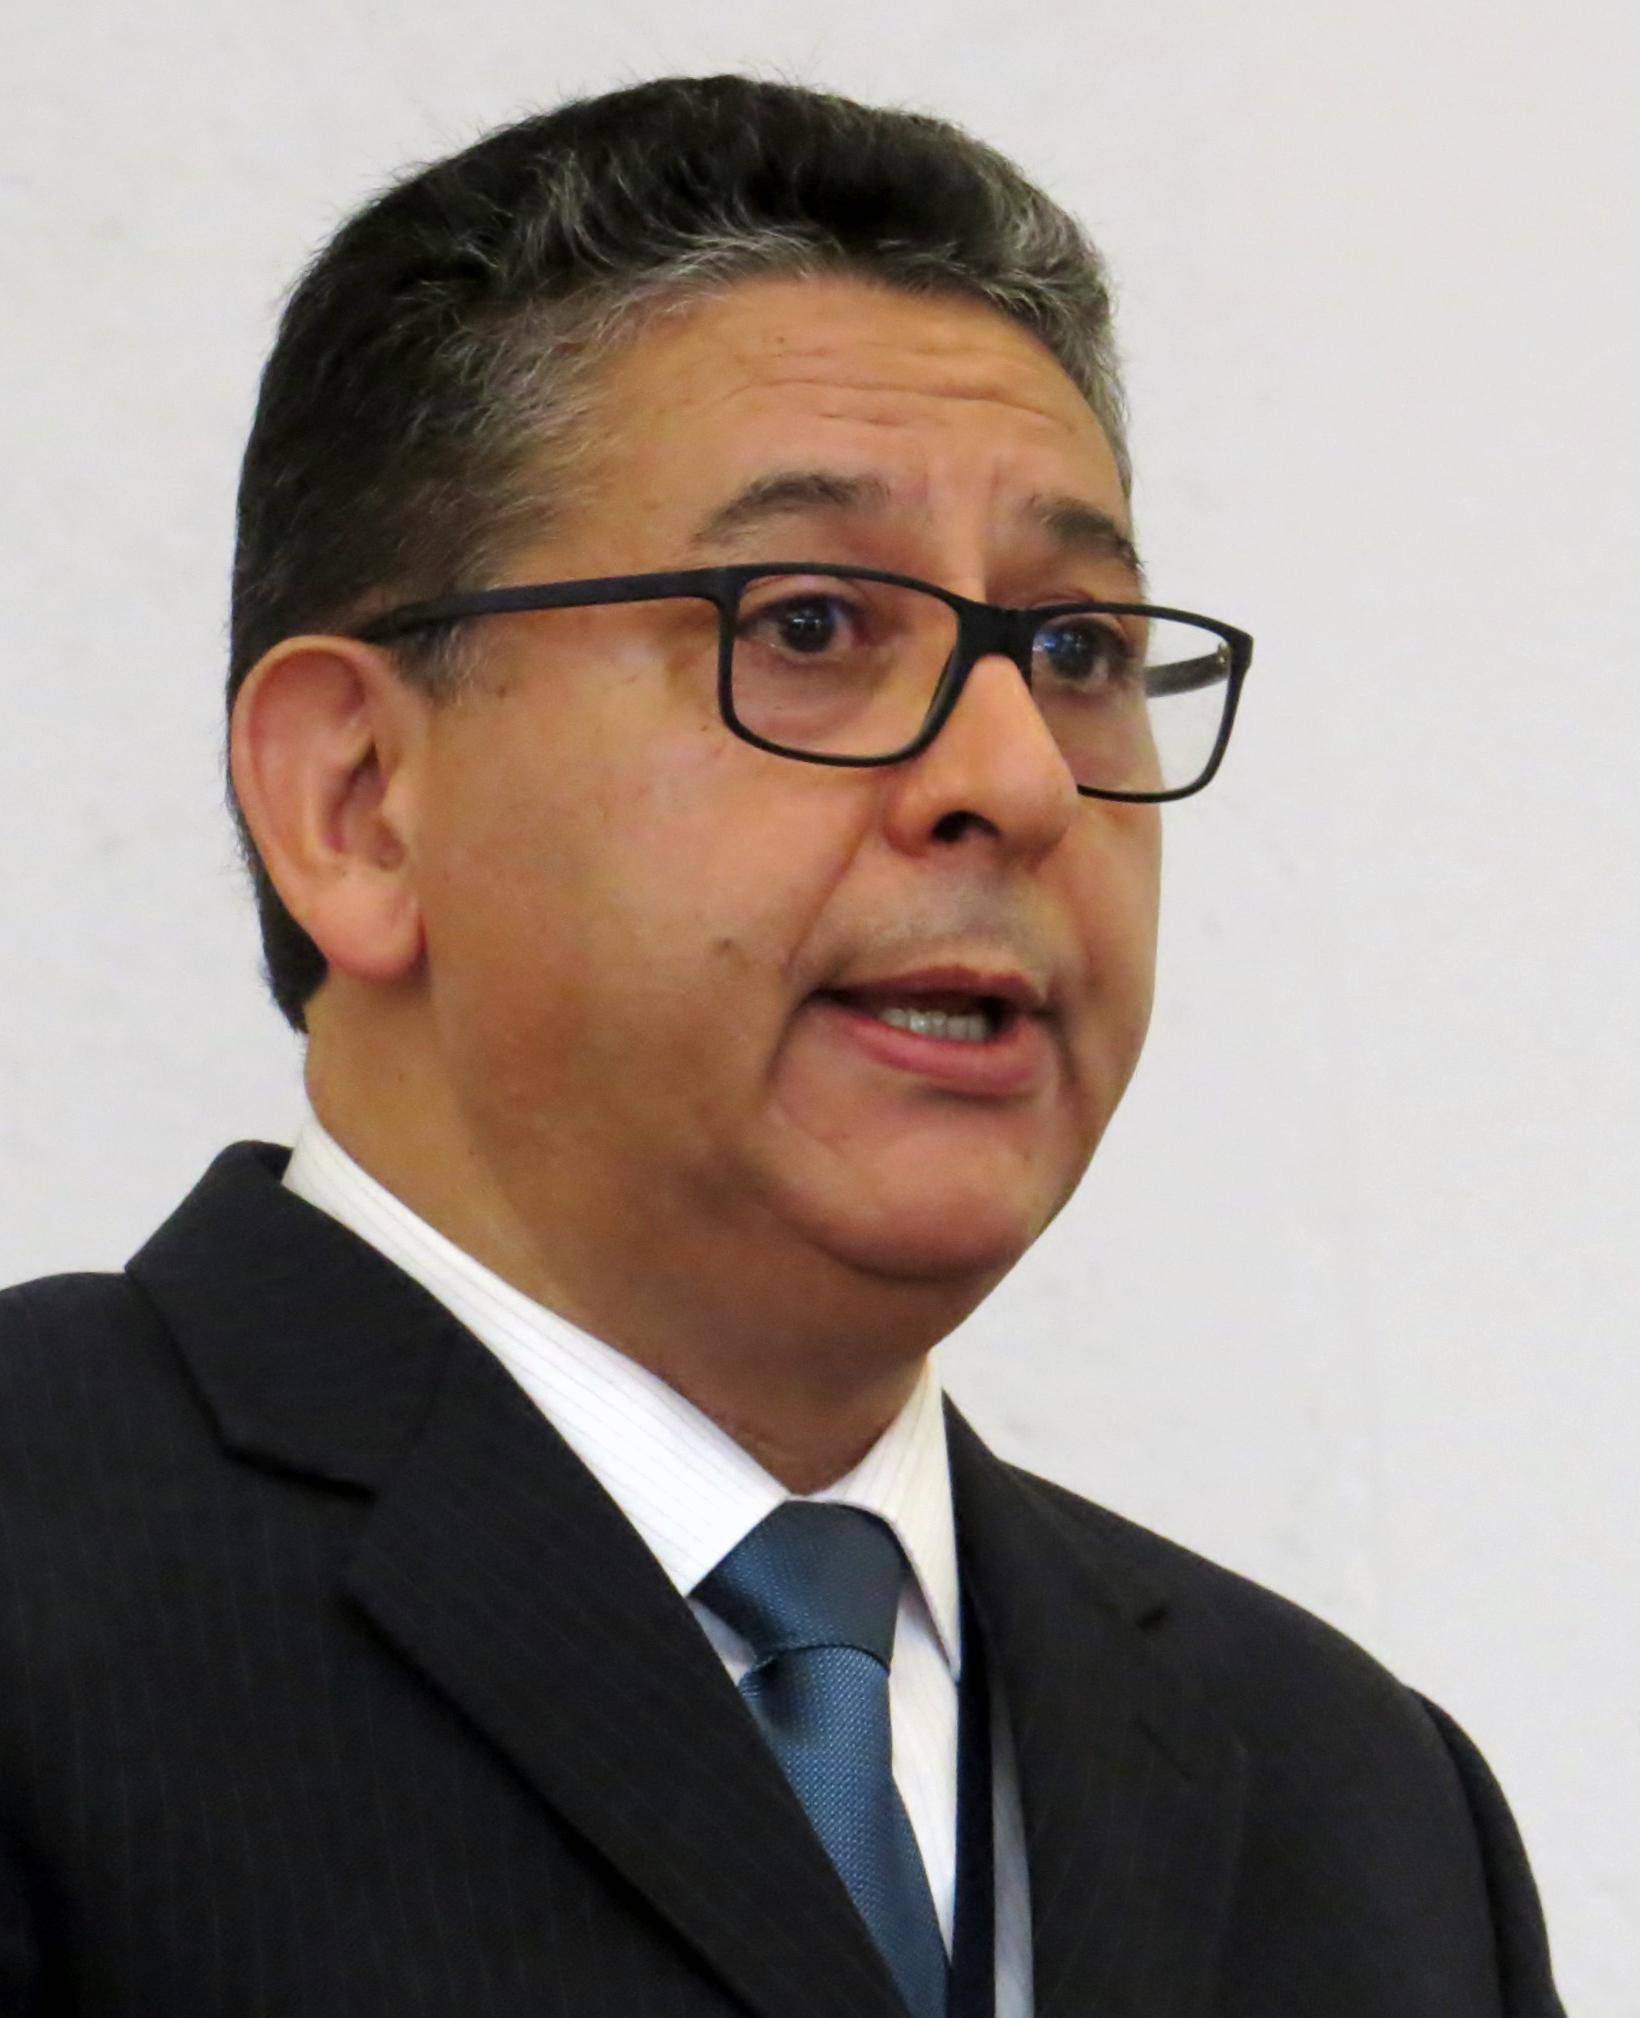 IAMSCU President Marcio de Moraes speaks during the 2017 IAMSCU conference in Puebla, Mexico. Photo by Sam Hodges, UMNS.